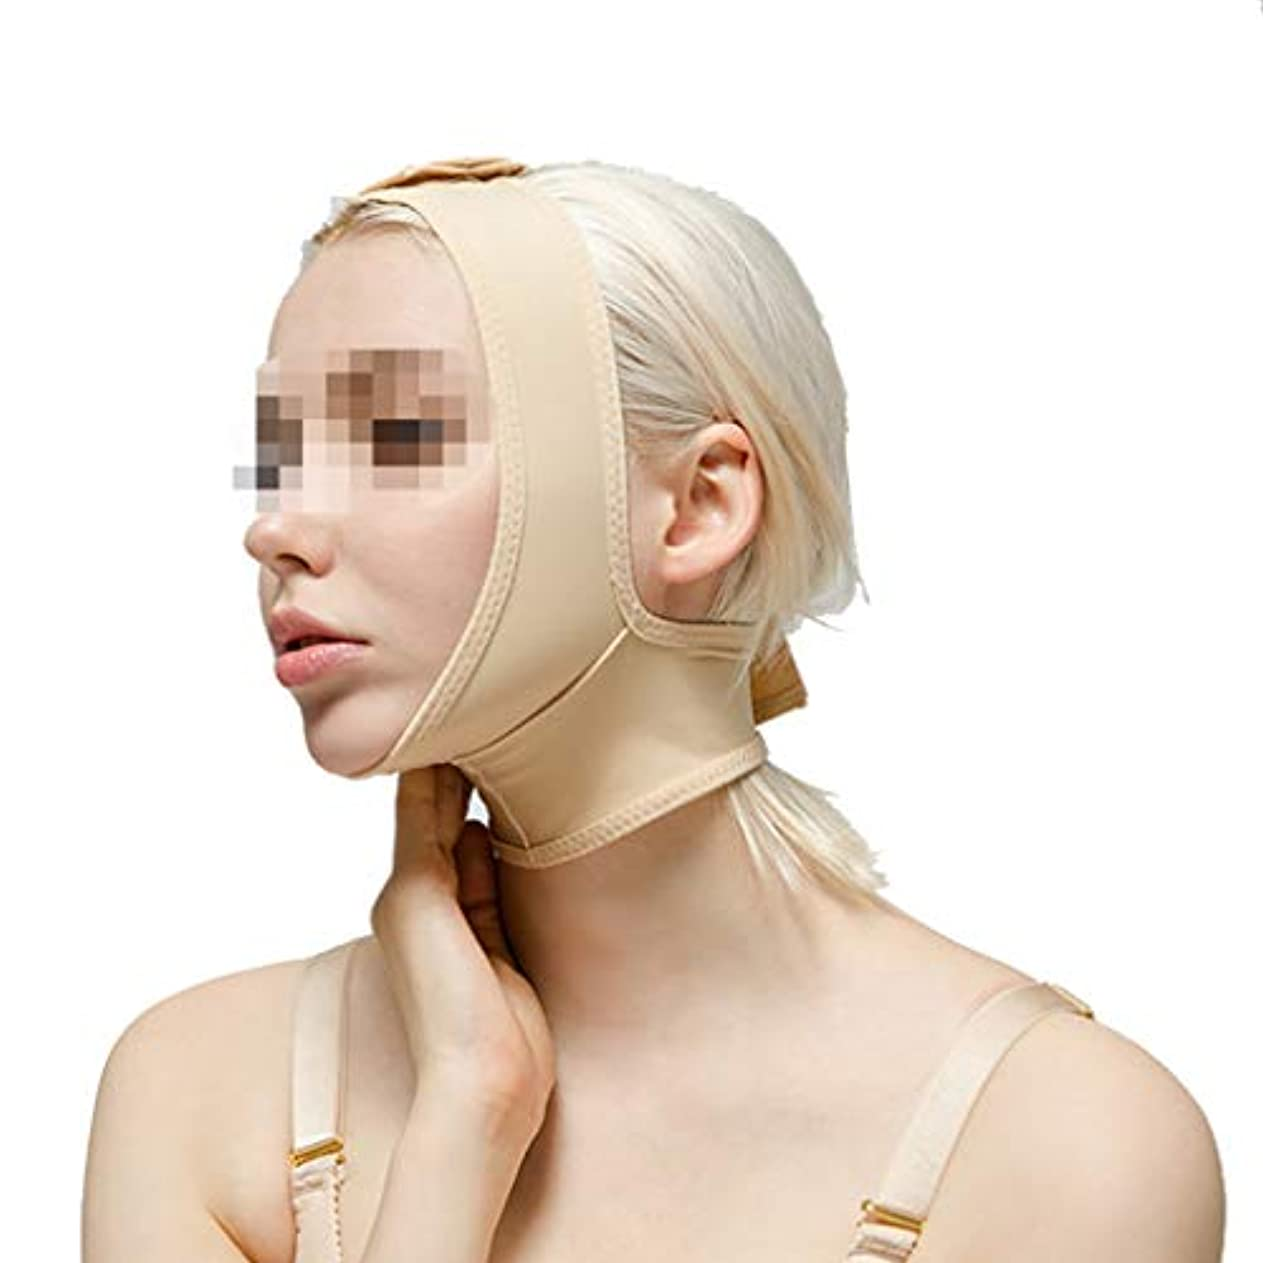 XHLMRMJ 術後の弾性スリーブ、下顎の束フェイス包帯フェイシャルビームダブルチンシンフェイスマスクマルチサイズオプション (Size : XXL)